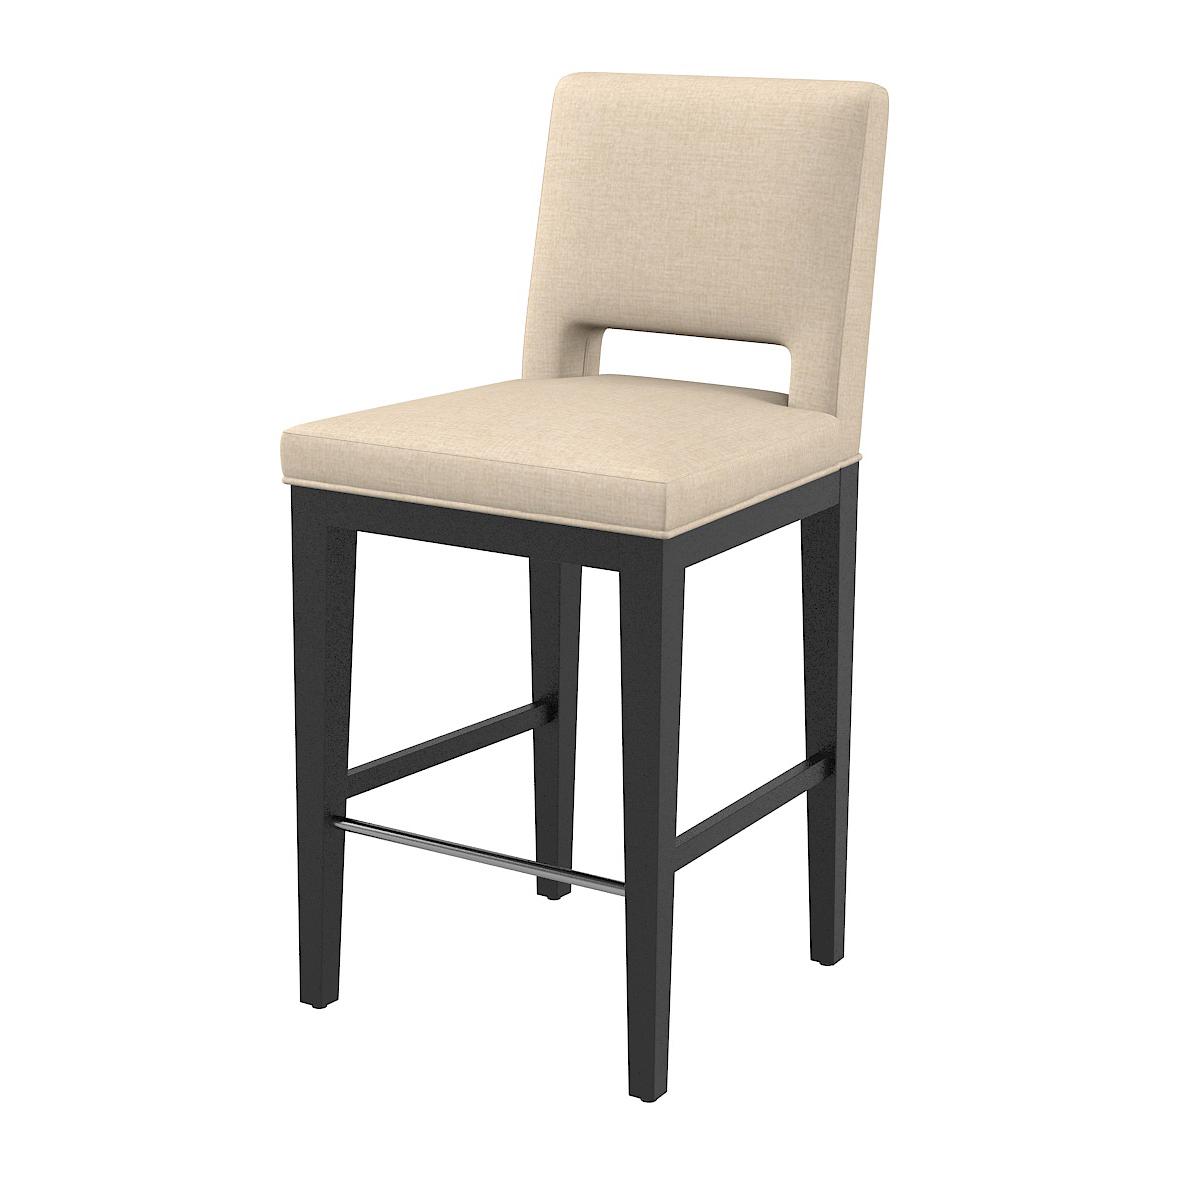 Enjoyable Dantonehome Douglas Barstool Machost Co Dining Chair Design Ideas Machostcouk